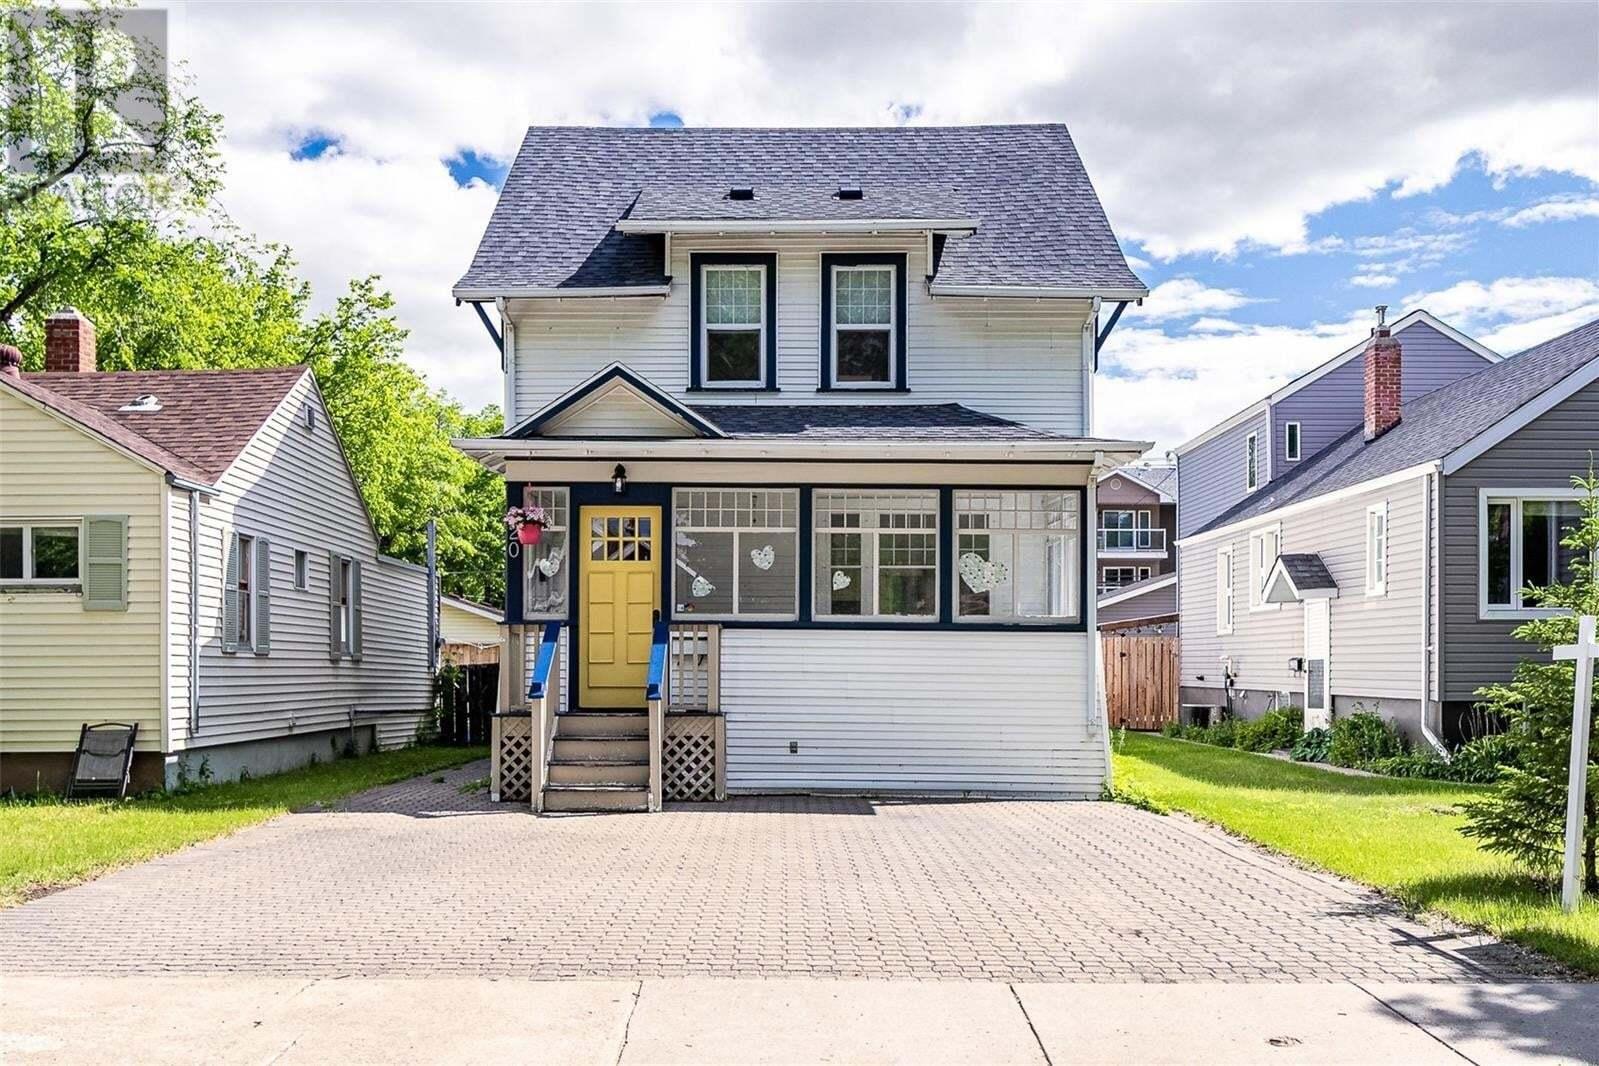 House for sale at 920 10th St E Saskatoon Saskatchewan - MLS: SK828880